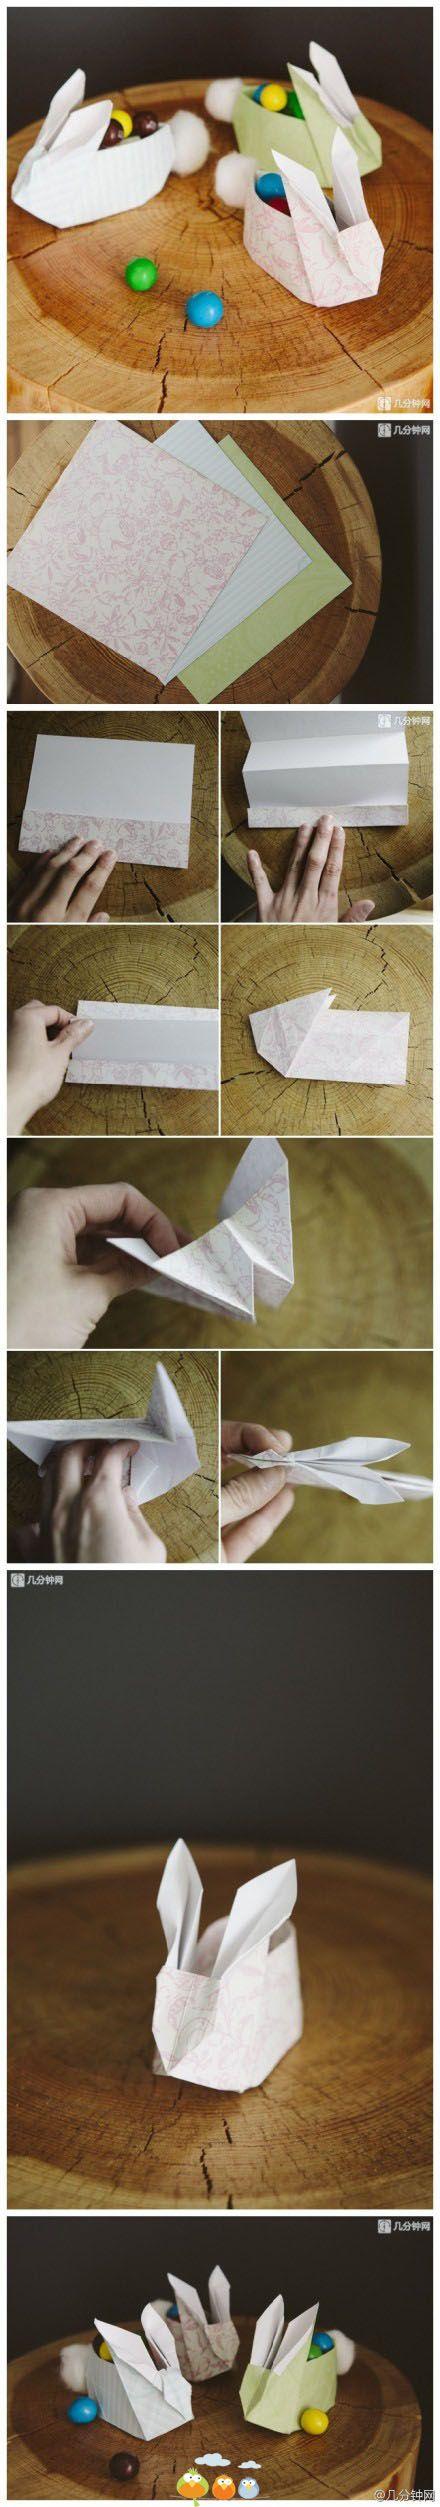 Origami flower box 01 origami box pinterest origami flower origami flower box mightylinksfo